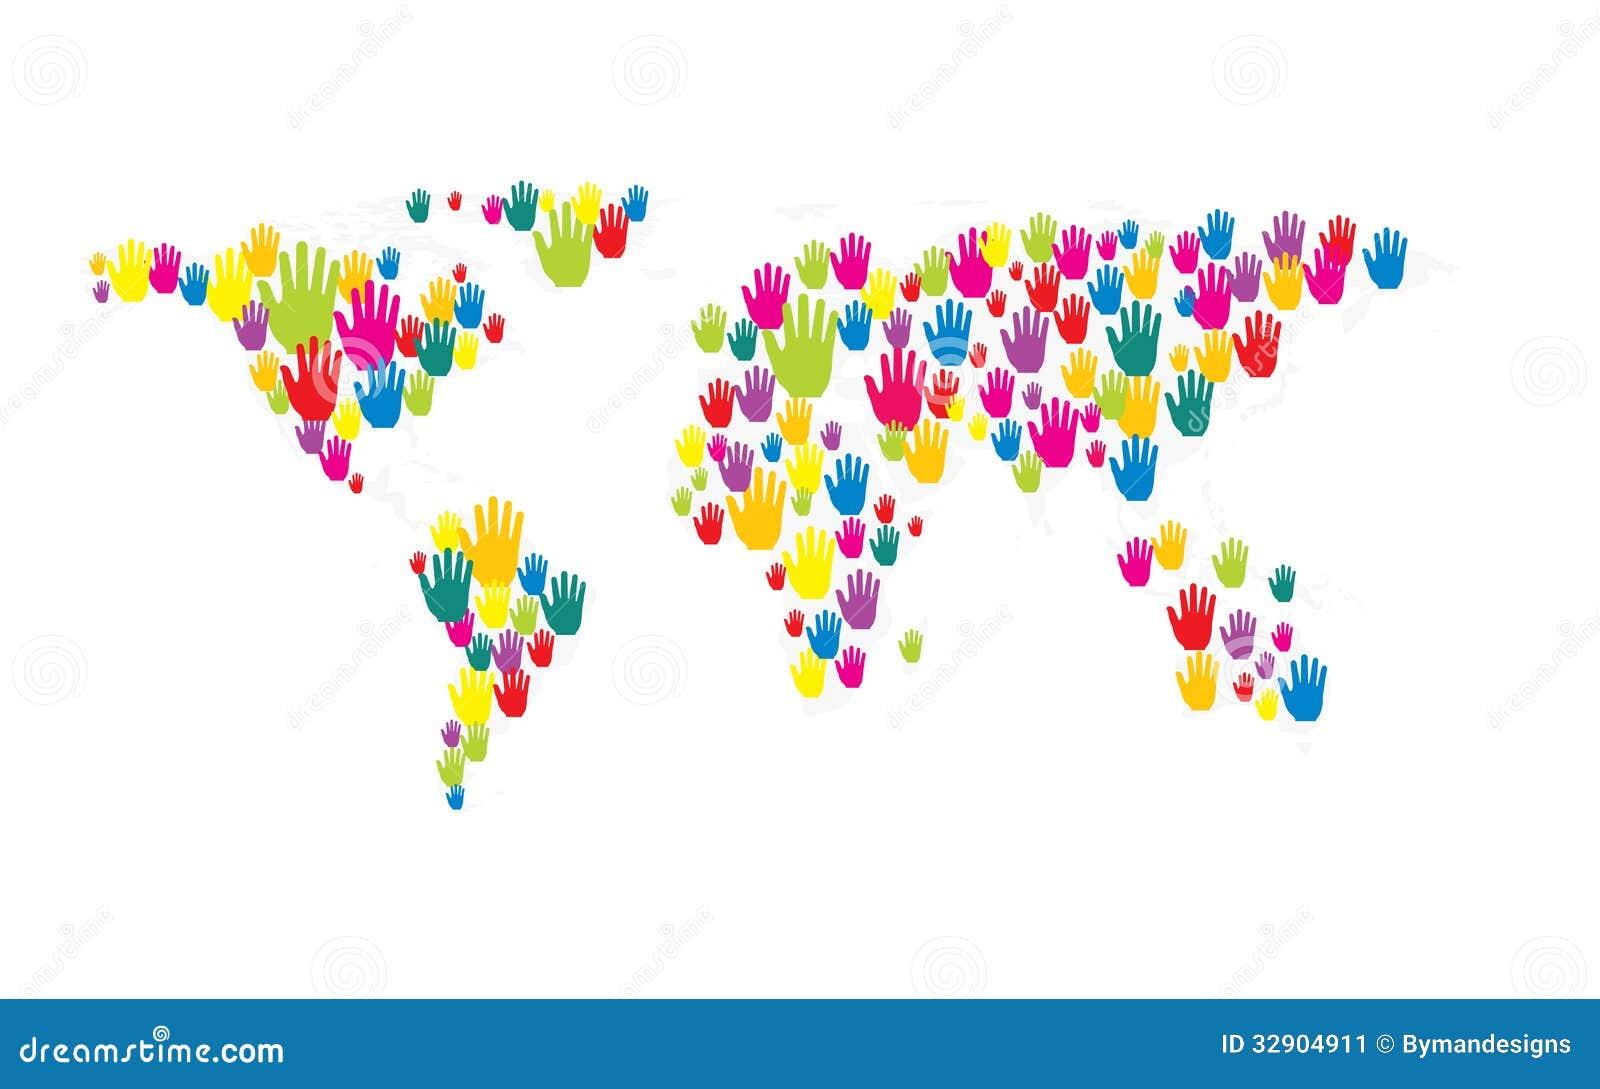 Vector hands world map stock vector illustration of image 32904911 vector hands world map gumiabroncs Images